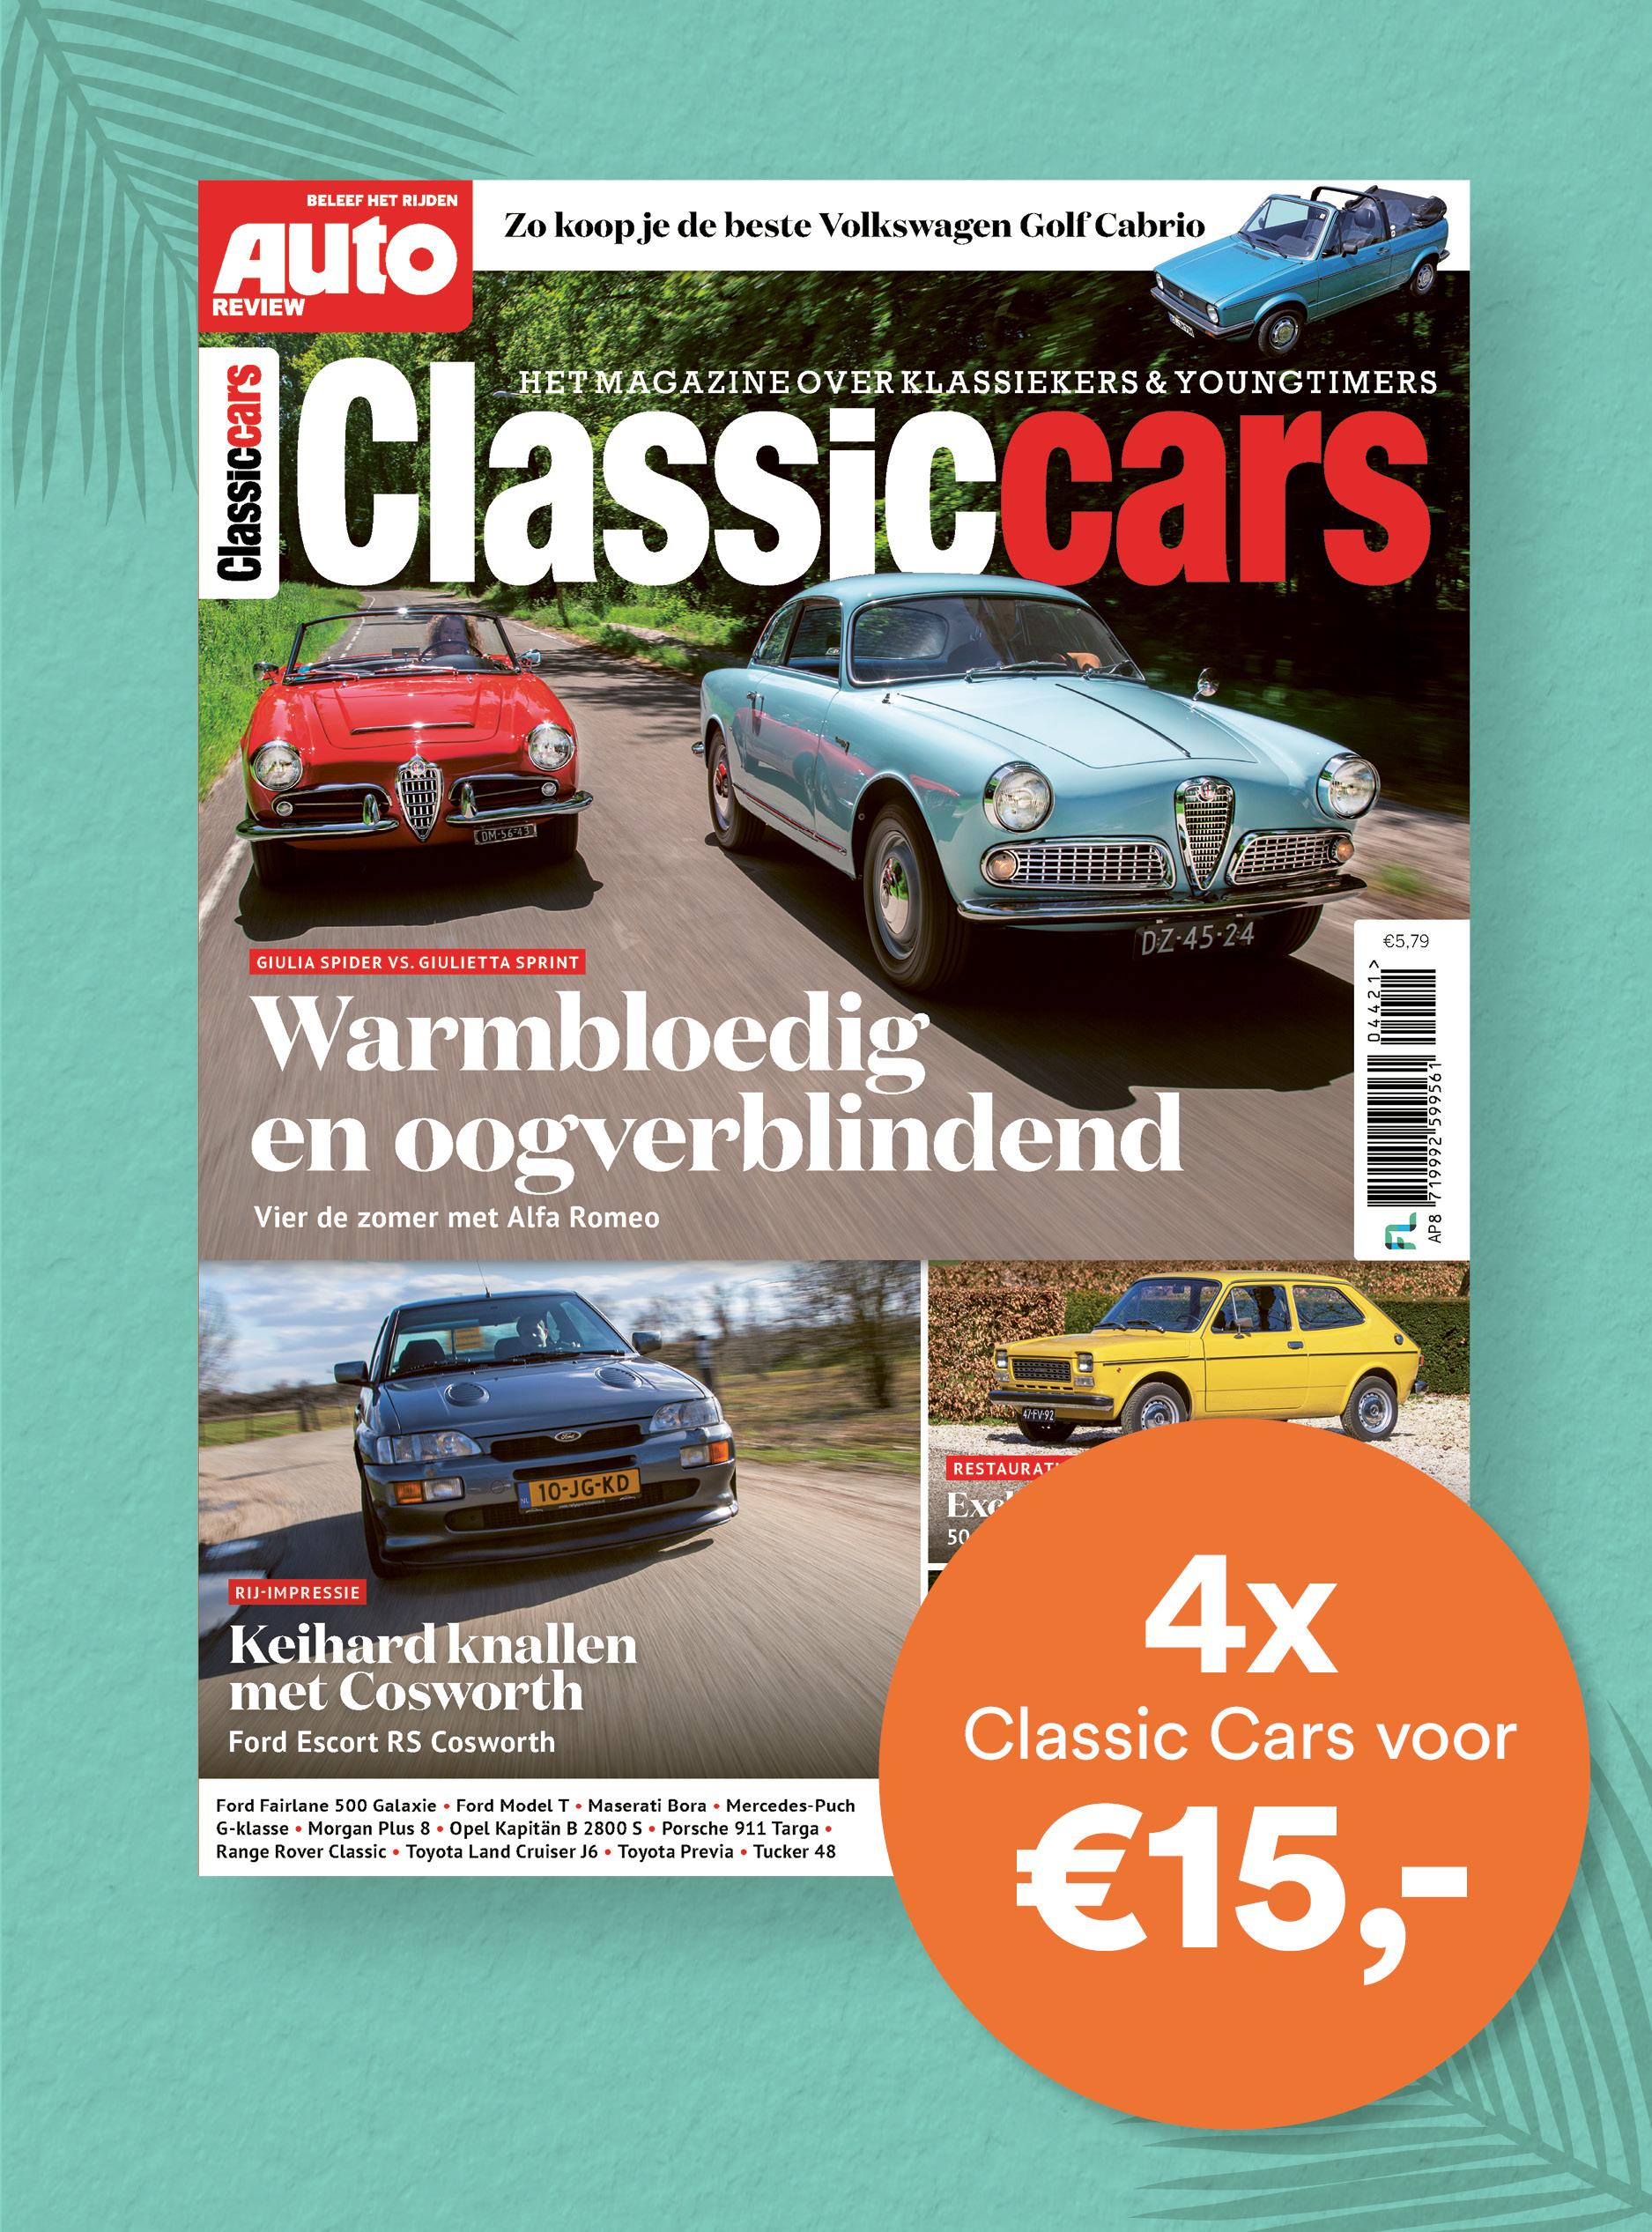 Afbeelding Classic Cars